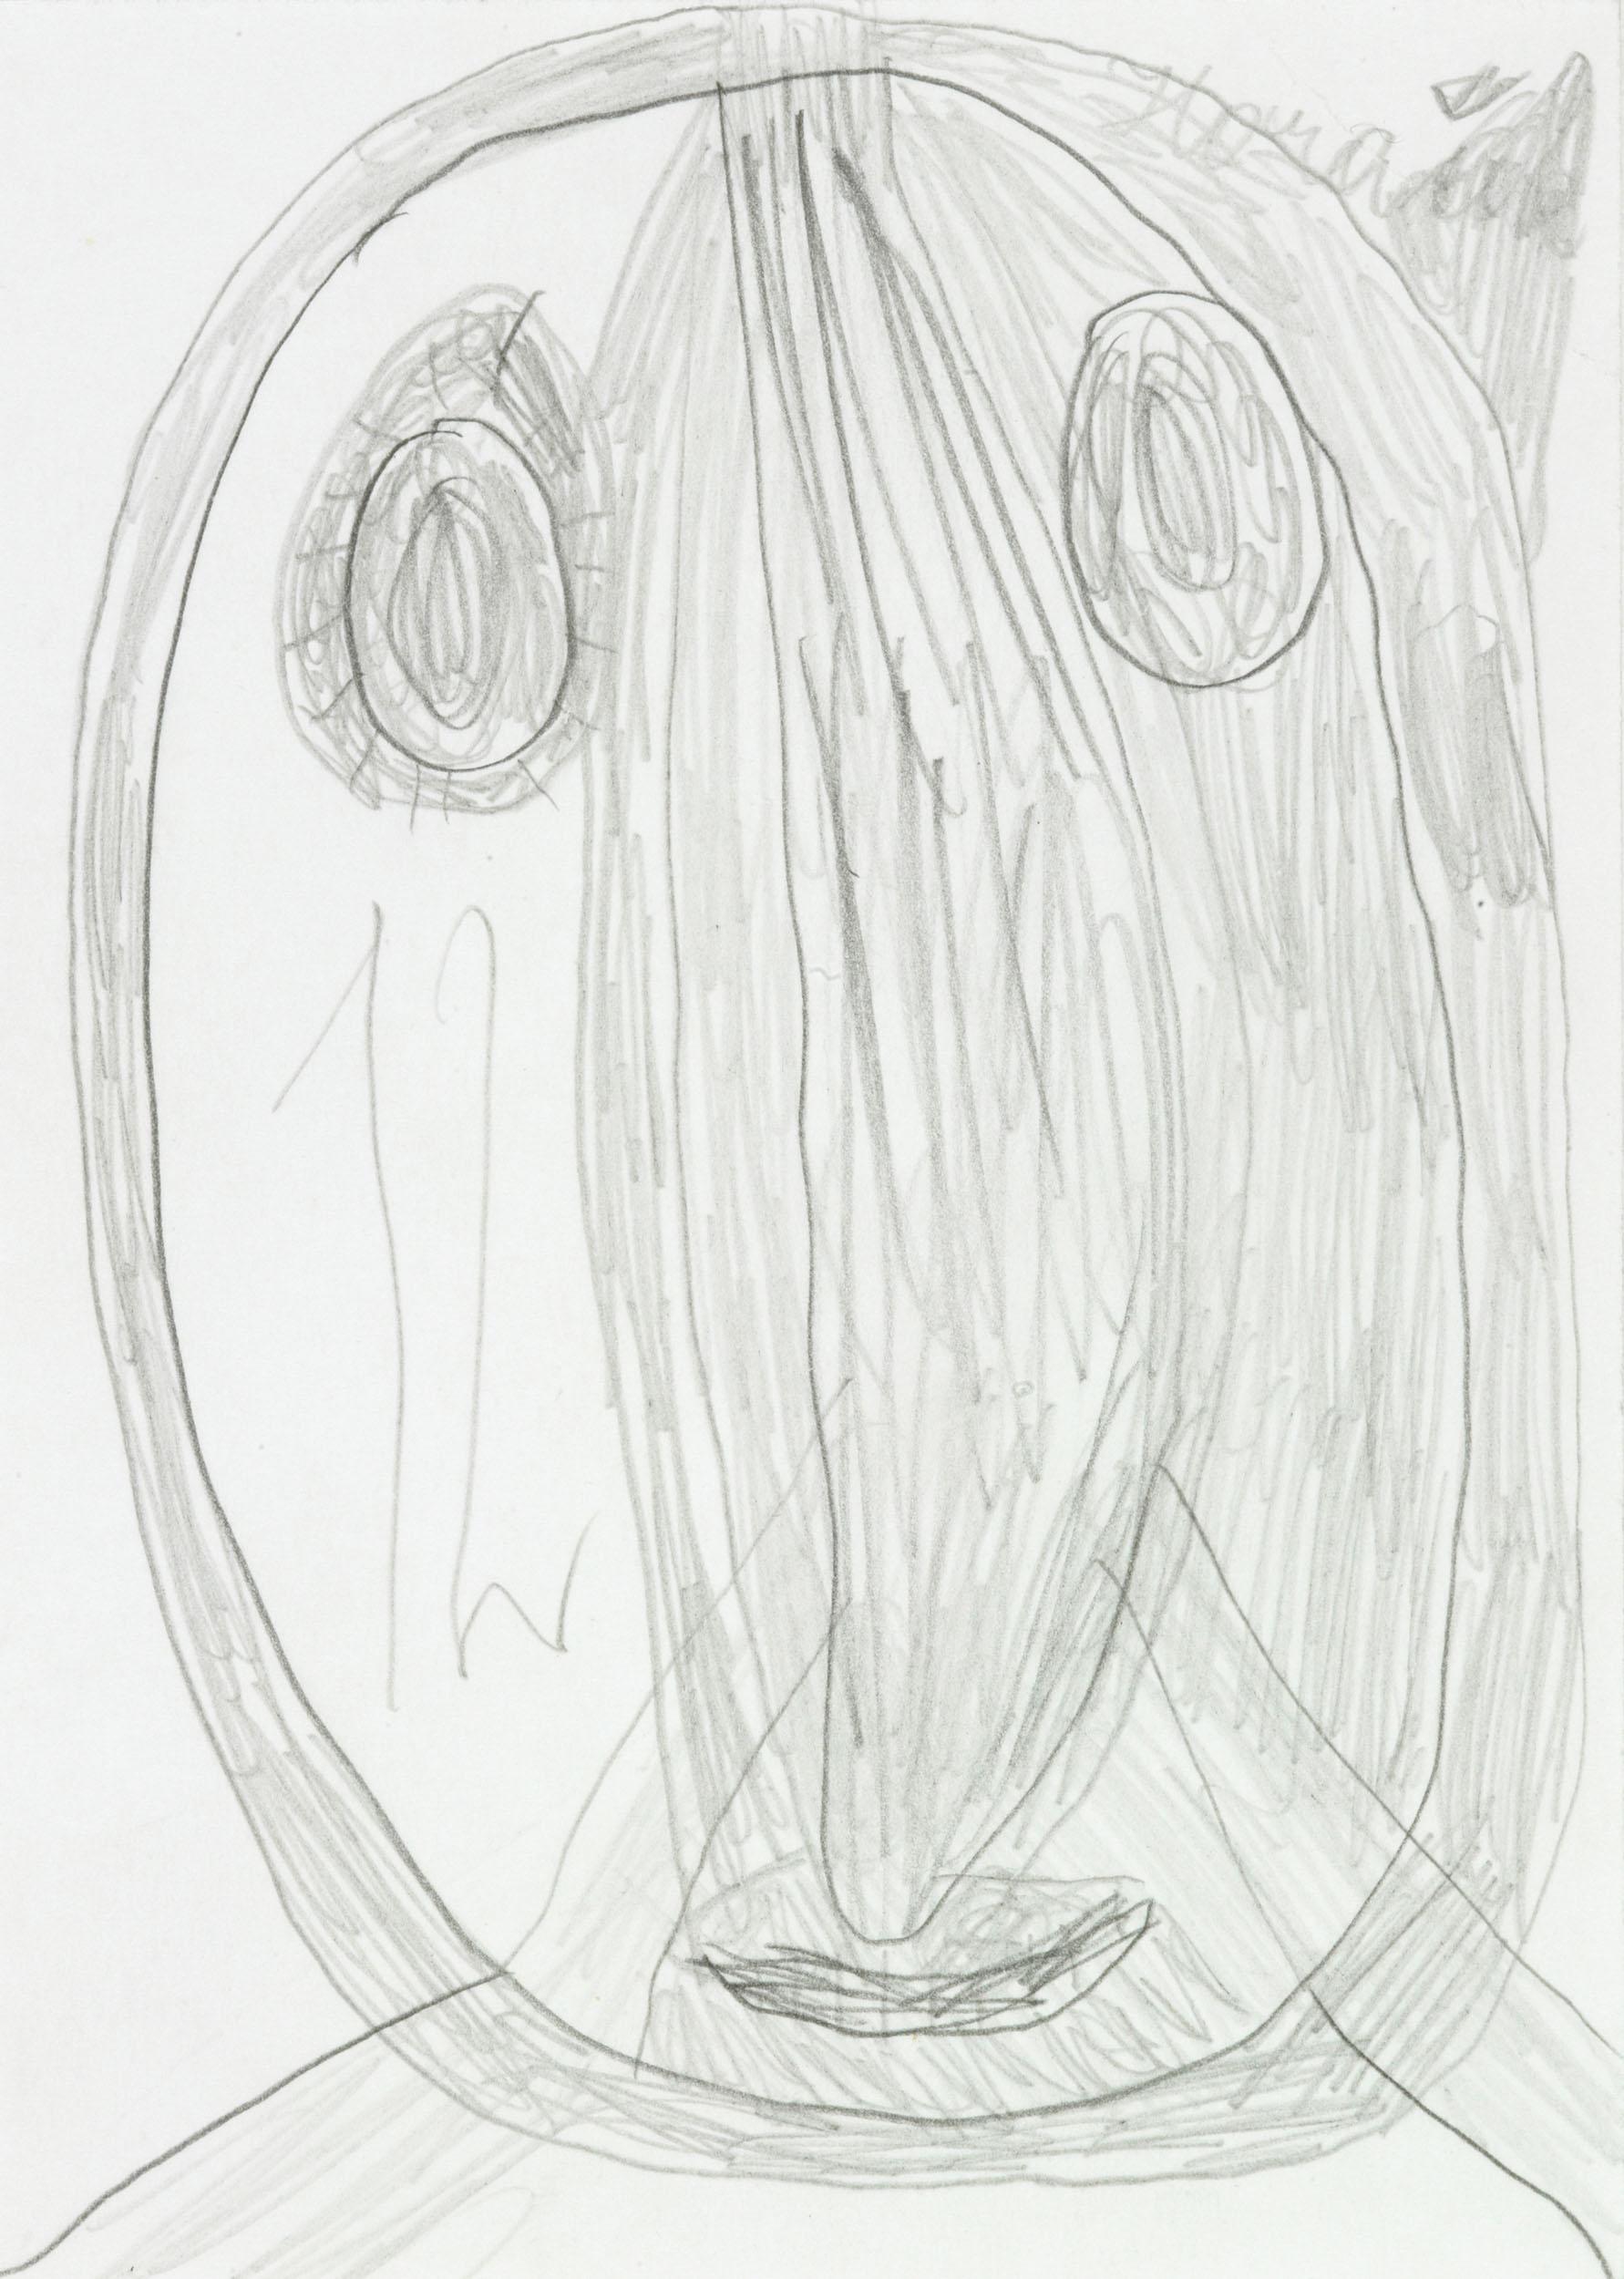 horacek rudolf - Kopf / Head